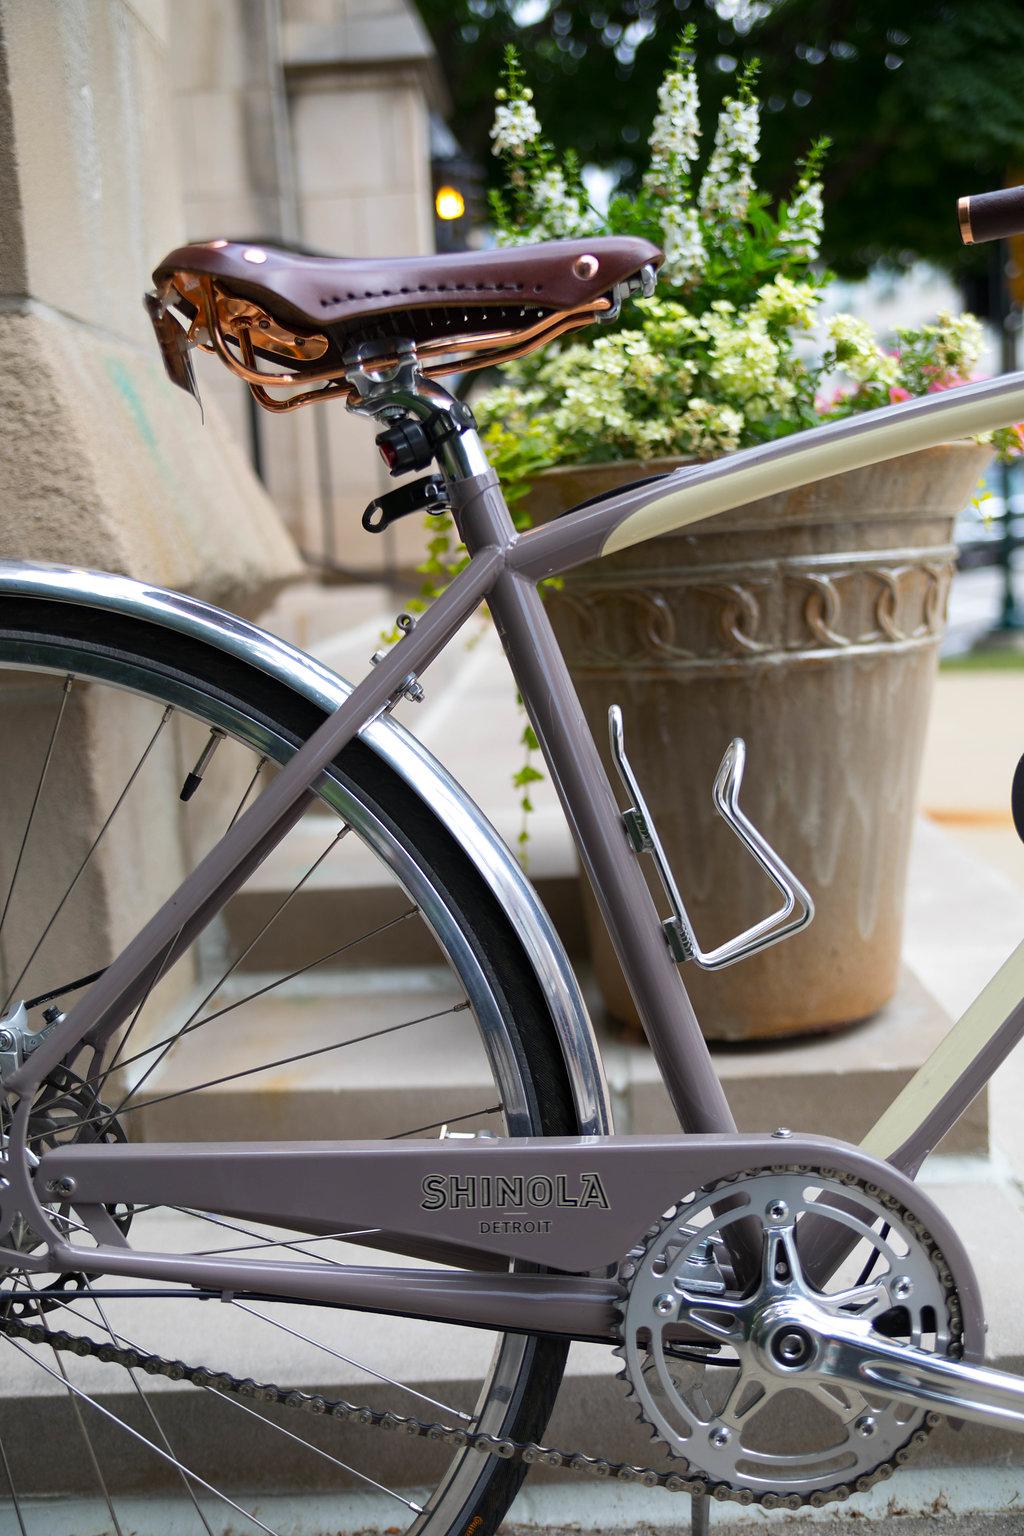 Shinola Detroit Bixby Bike Ride at Townsend Hotel Birmingham Michigan